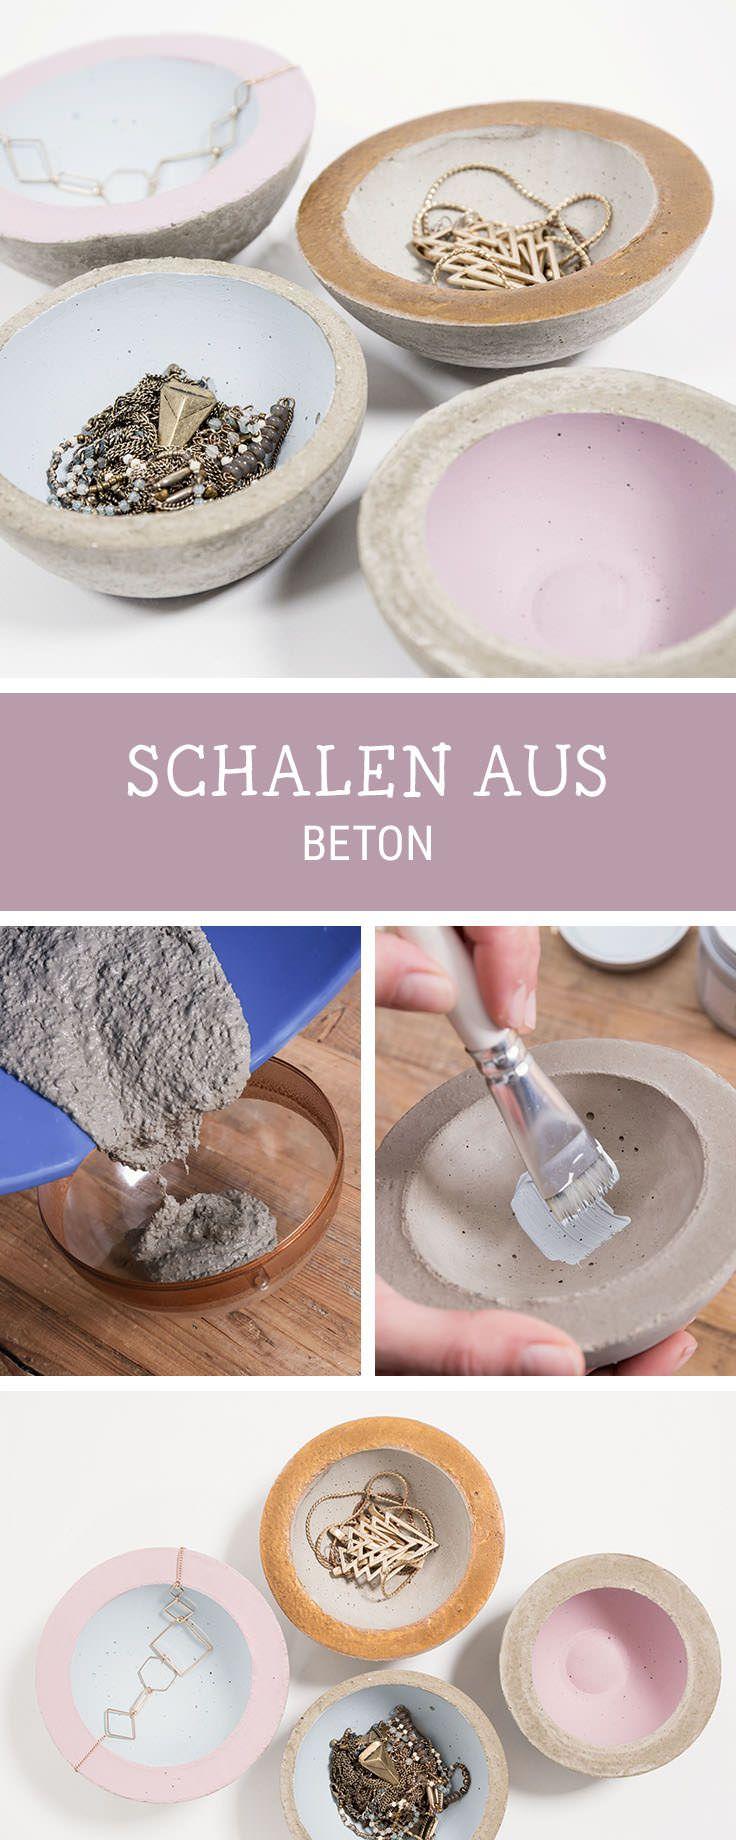 DIY Anleitung: Kleine Schalen Aus Beton Herstellen Via DaWanda.com